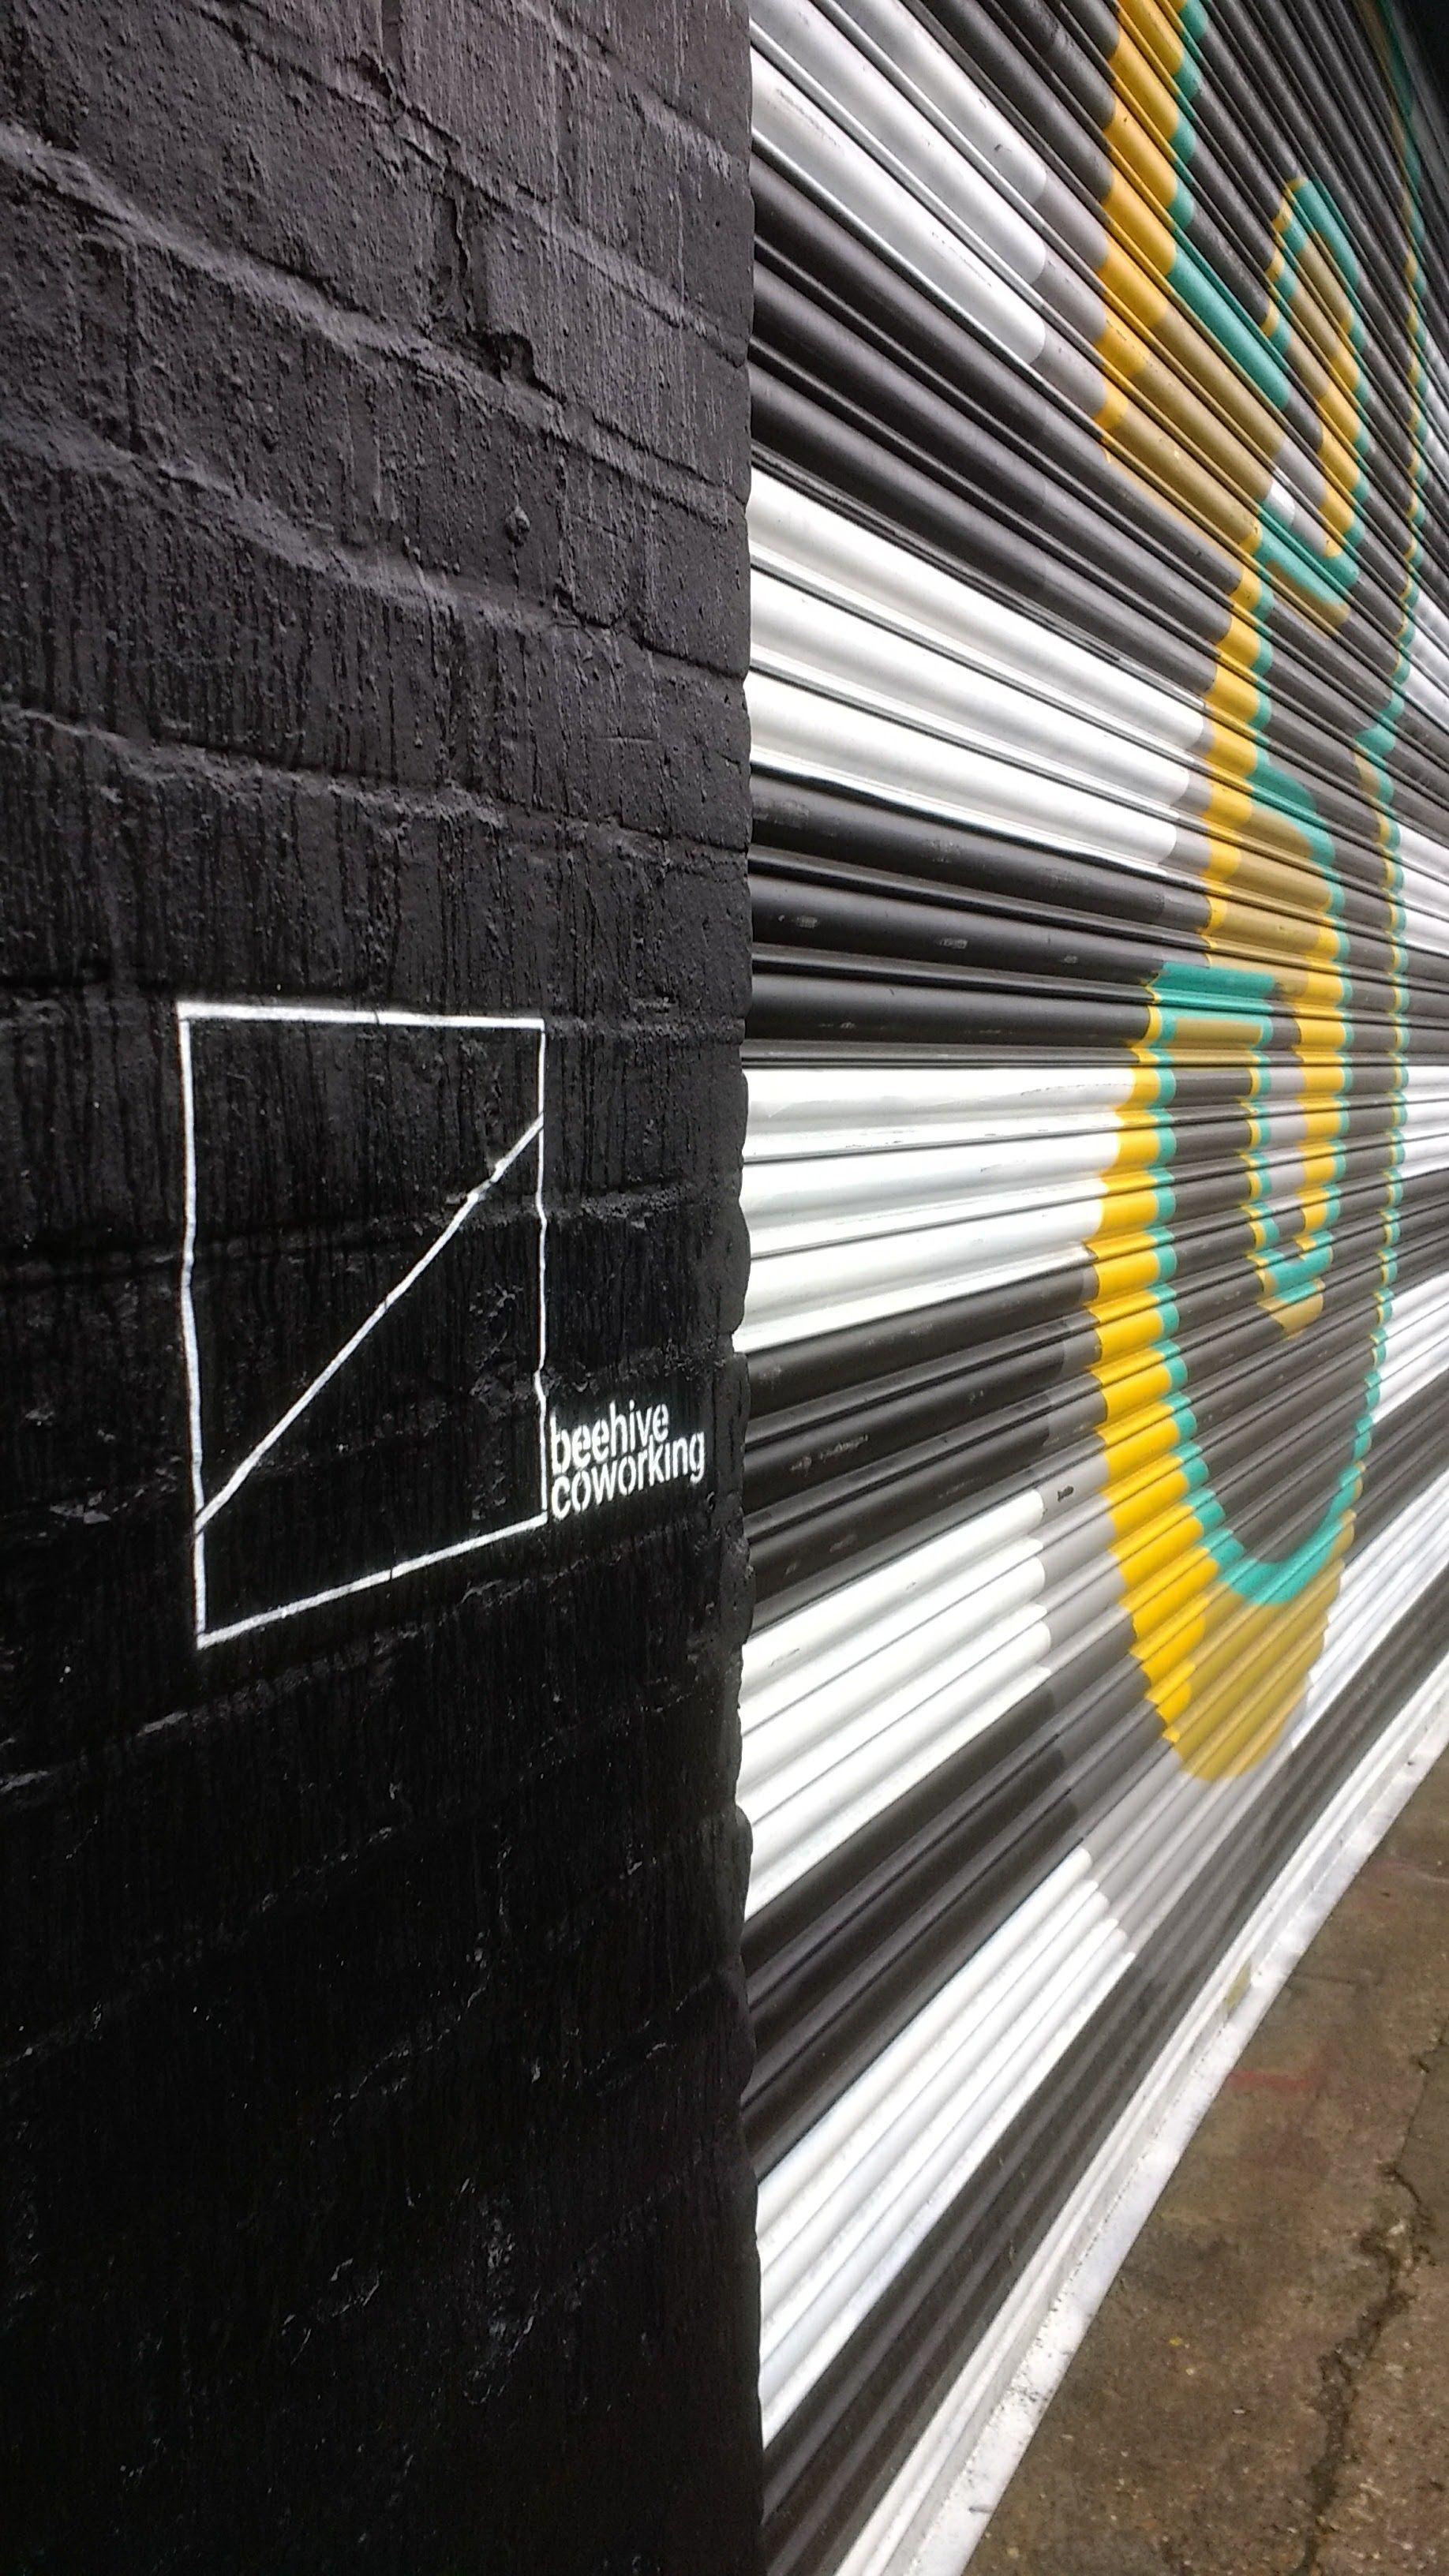 Beehive, London